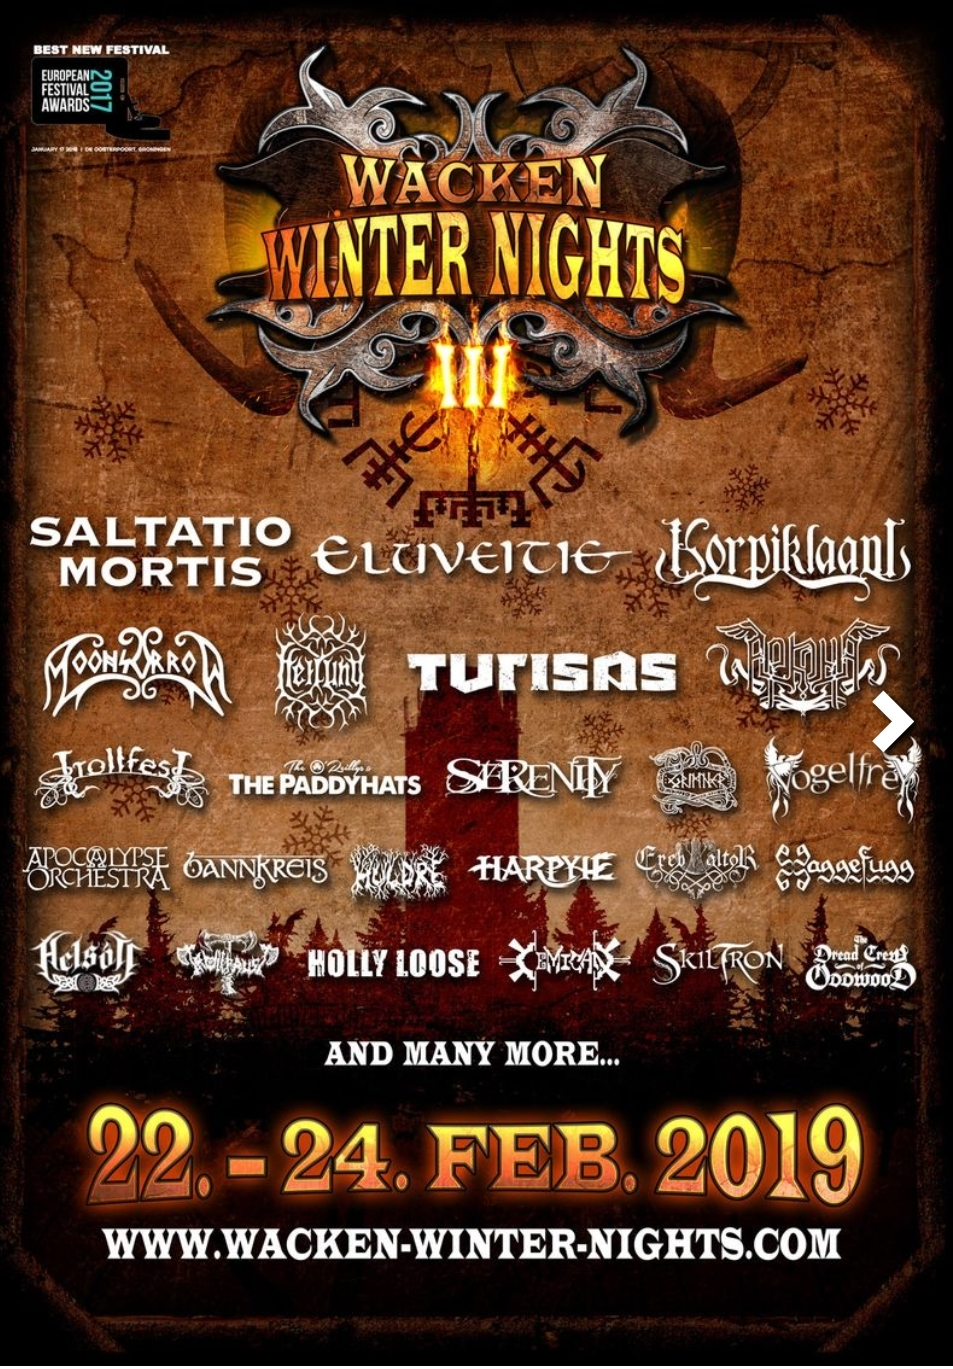 Wacken Winter Nights 22.-24.2.19